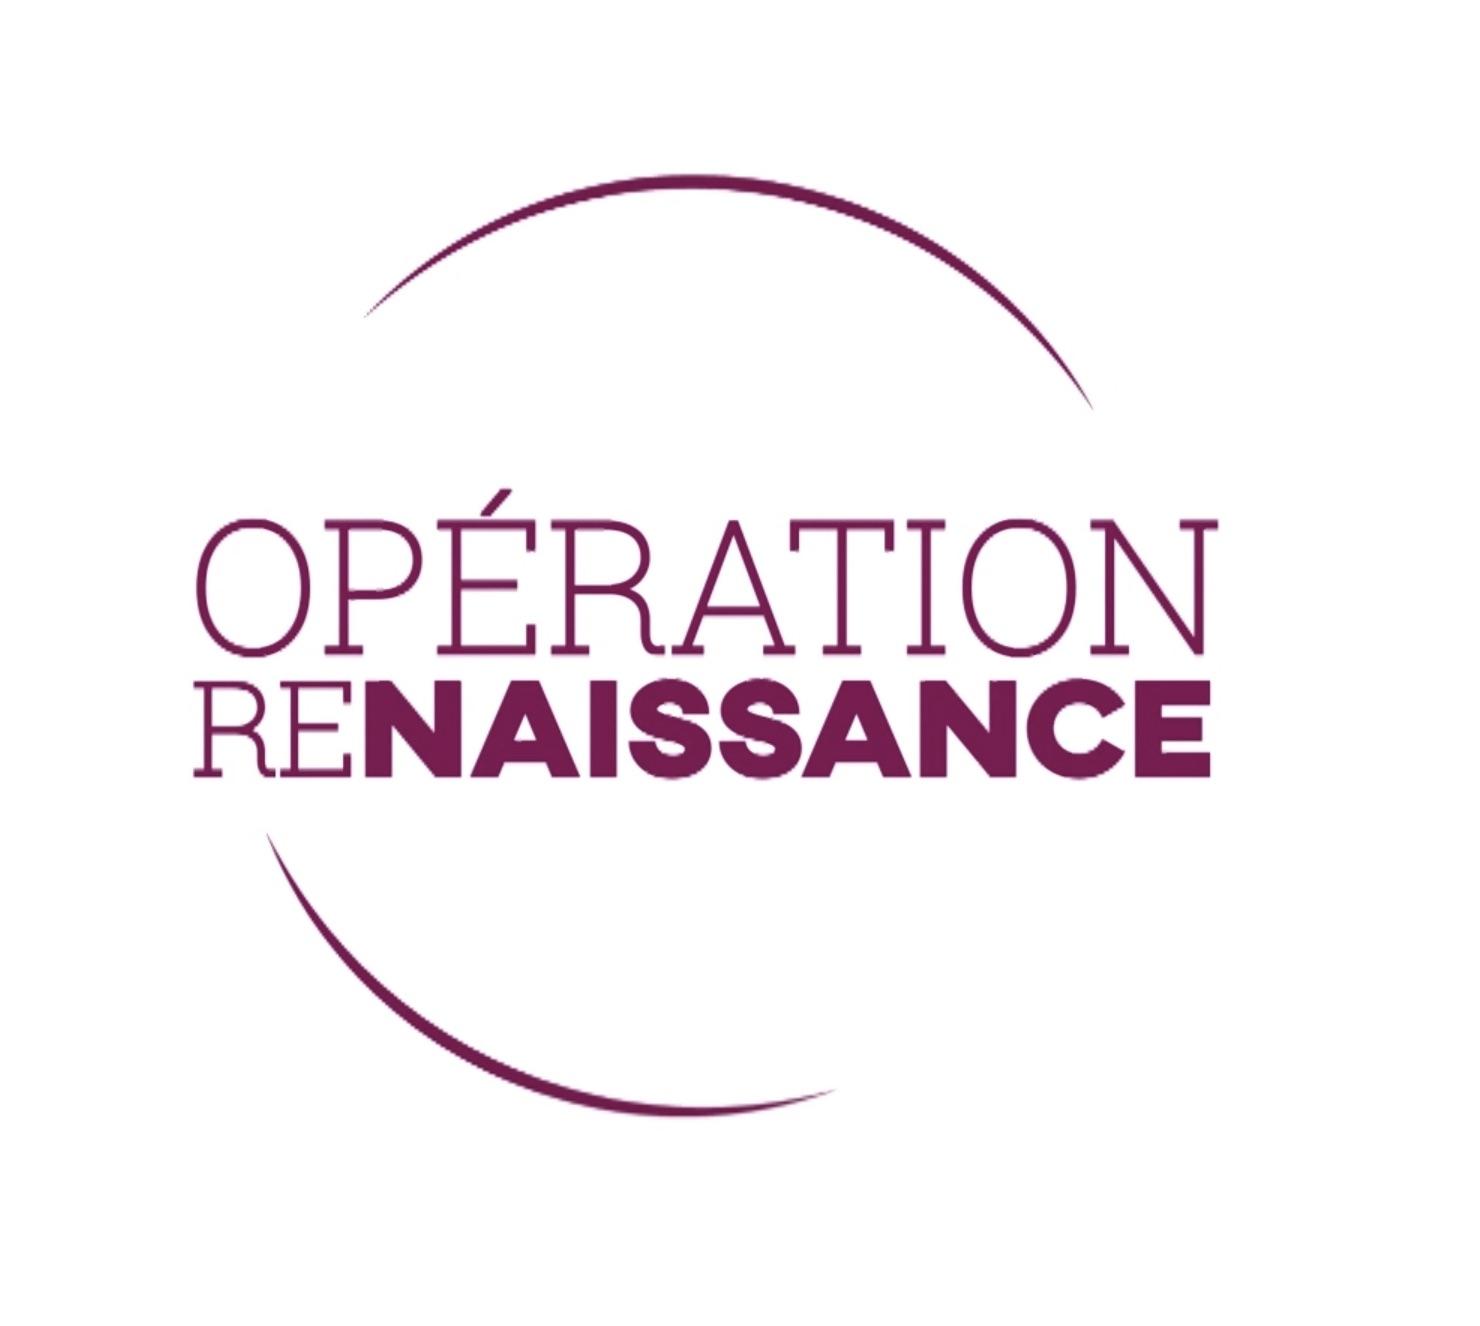 Opération renaissance - M6 - Karine Lemarchand -